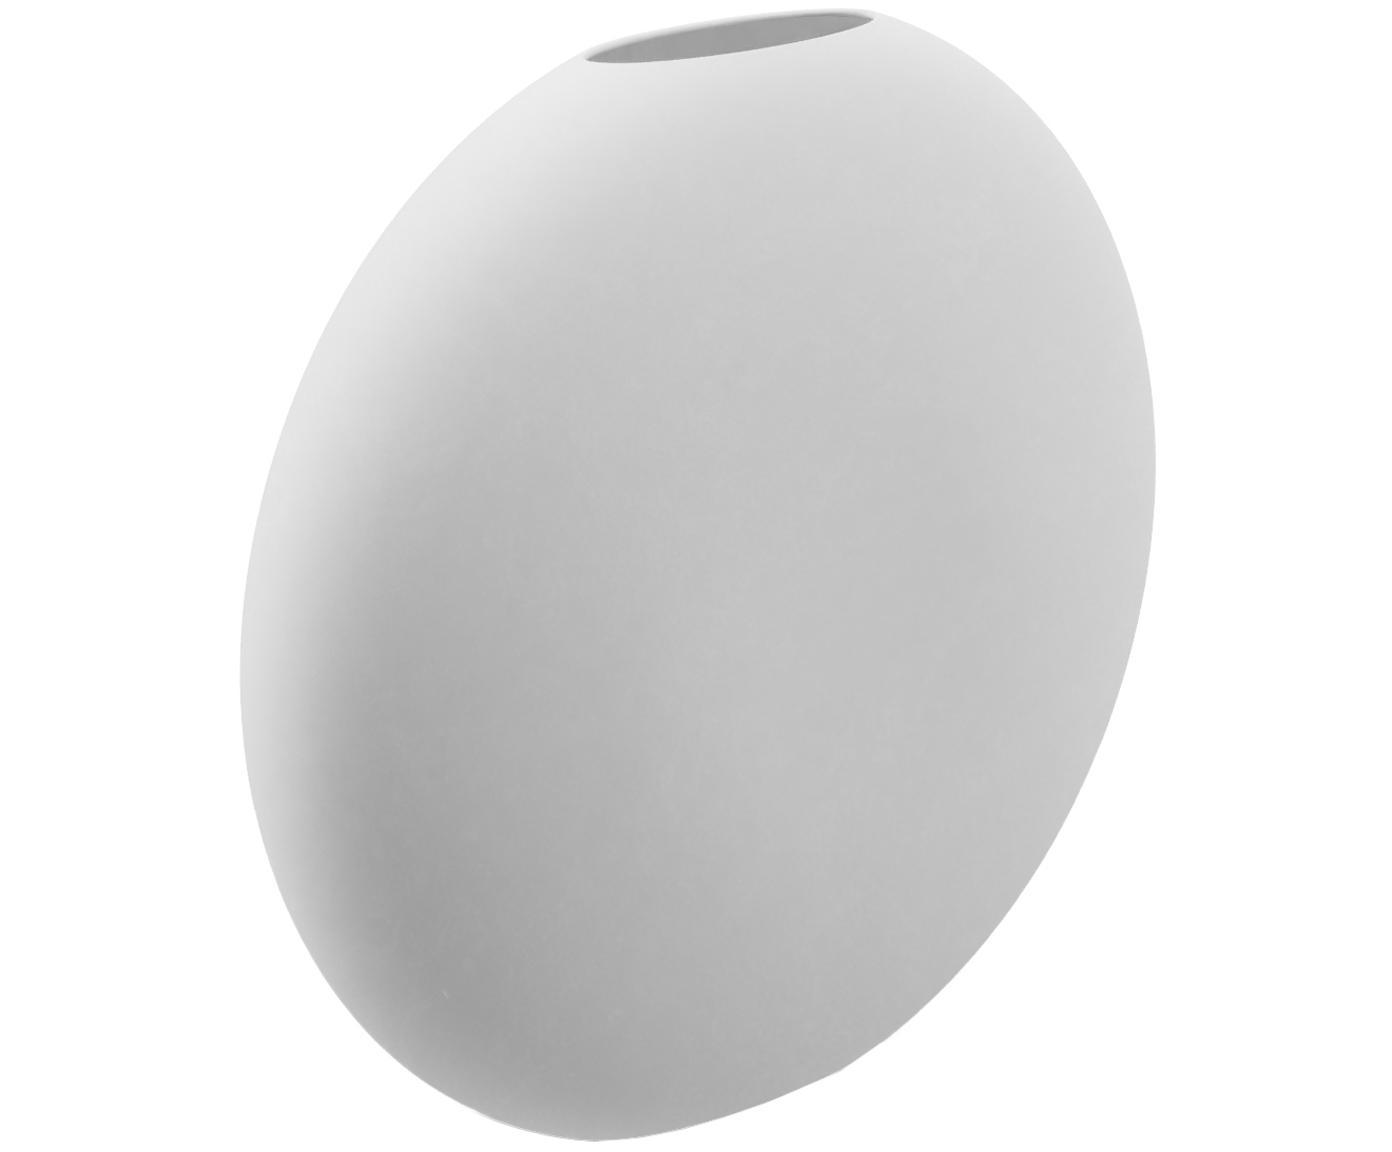 Handgefertigte Keramik-Vase Pastille, Keramik, Weiss, 20 x 19 cm